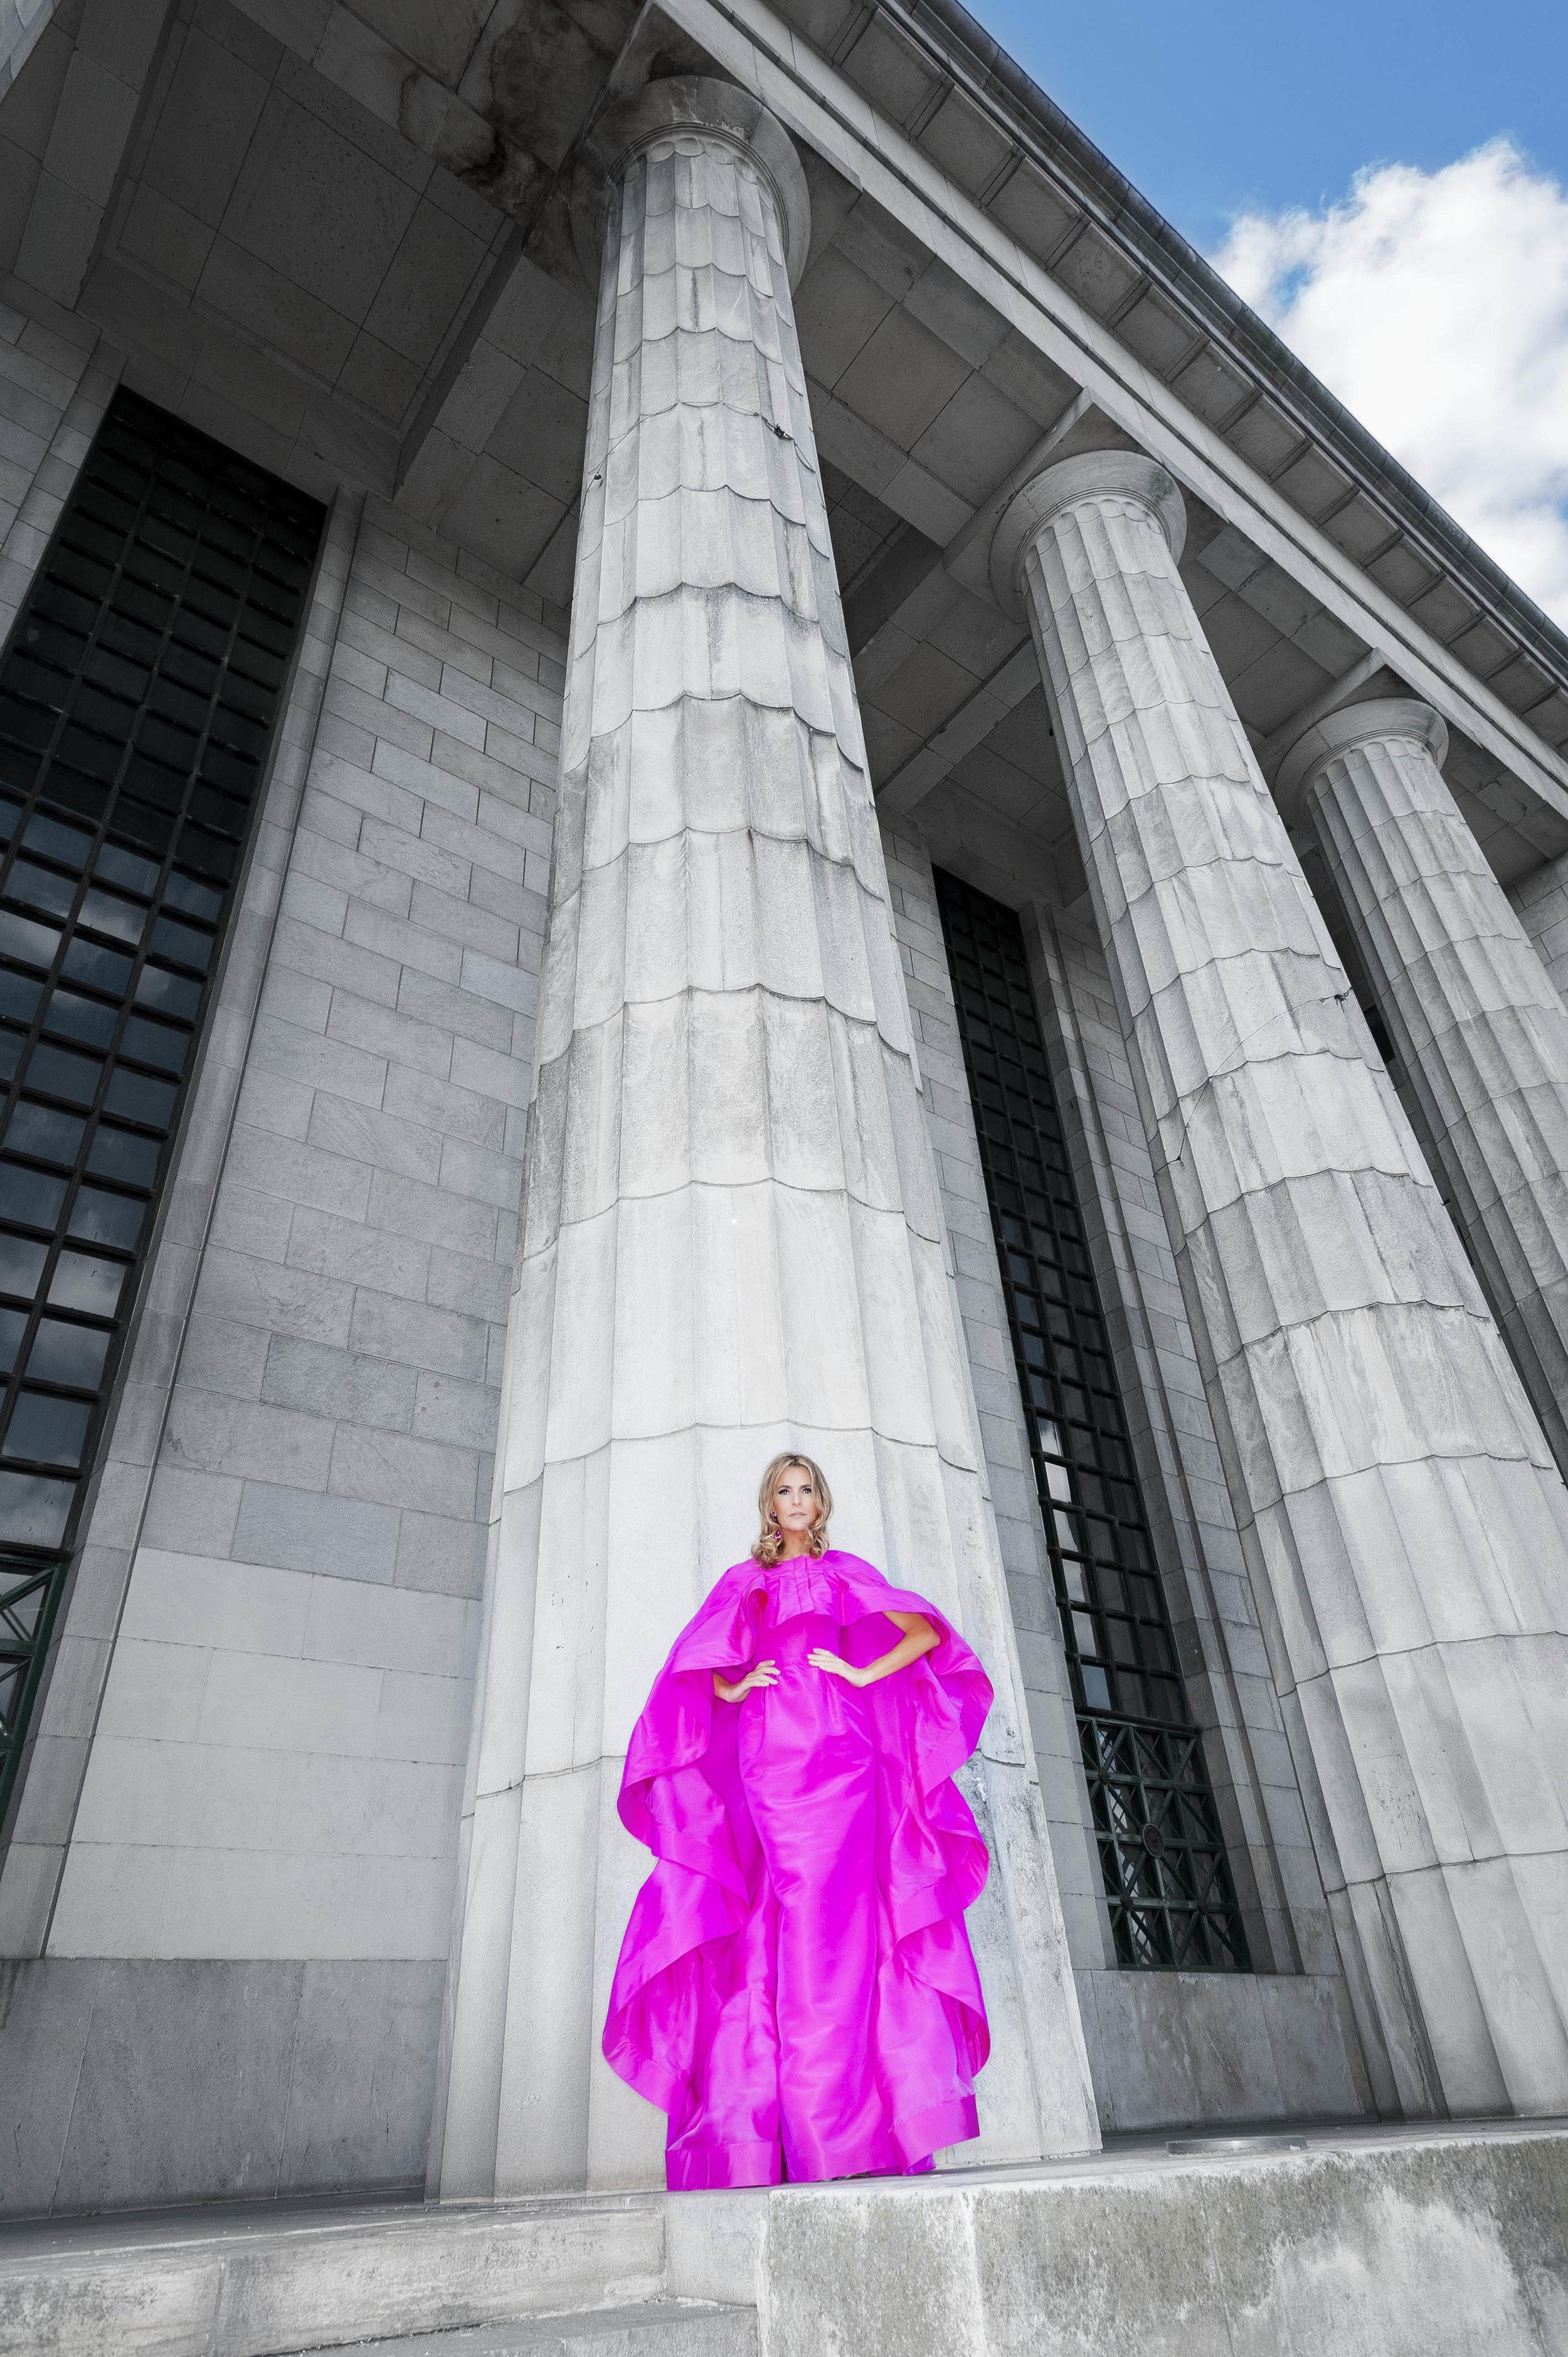 Tributo a Buenos Aires -  Oscar de la Renta  Fuchsia Cape Silk Dress